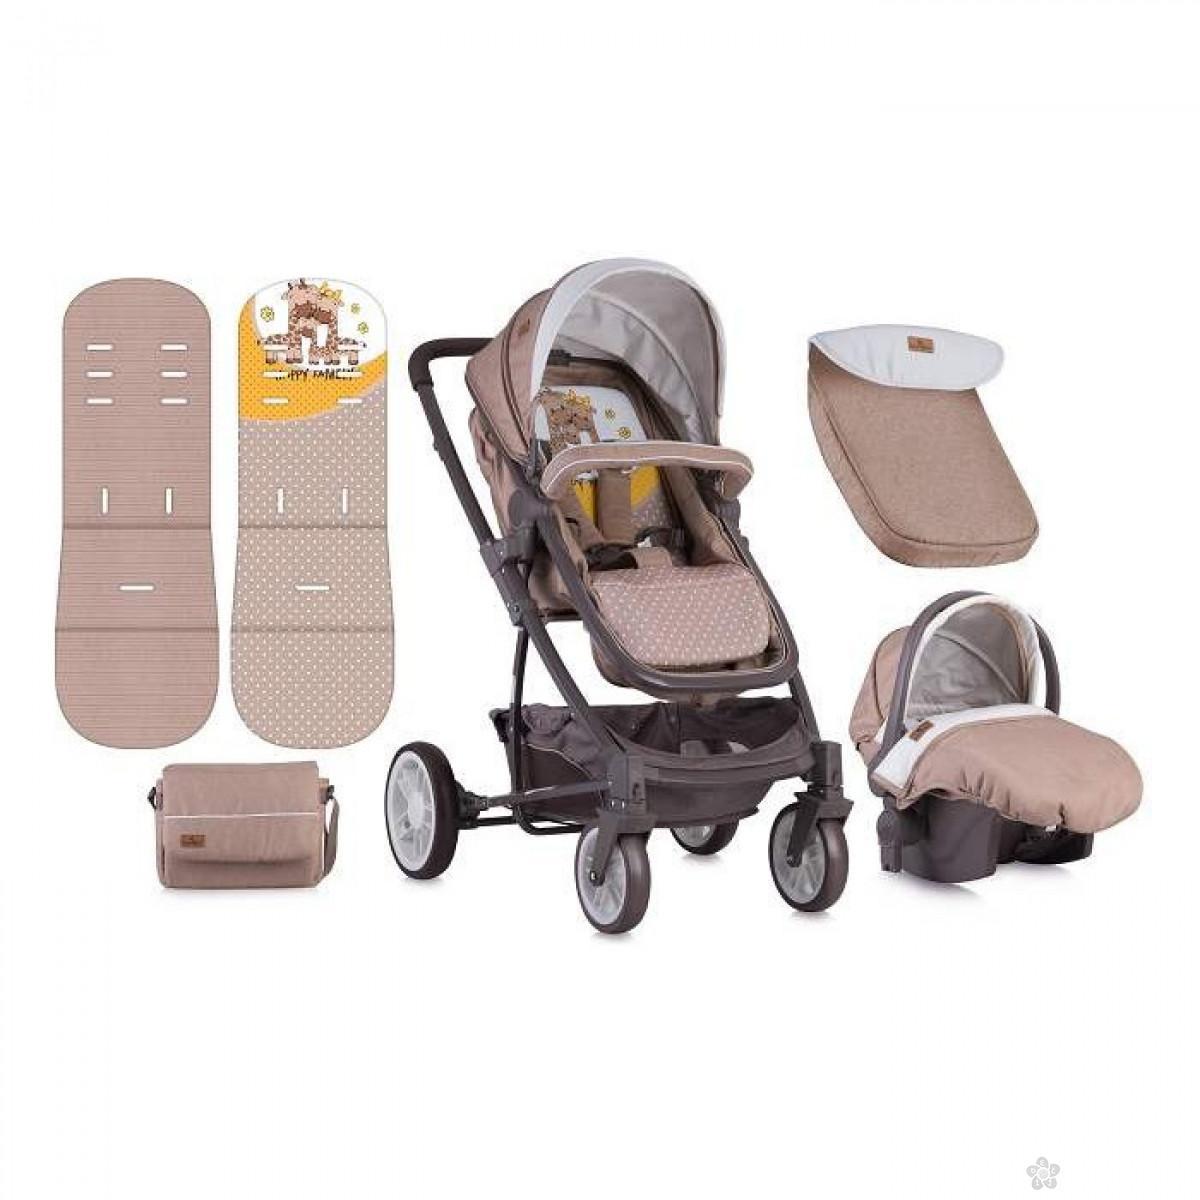 Lorelli Bertoni Kolica S-500 Set Beige&Yellow Happy Family, 10020851803